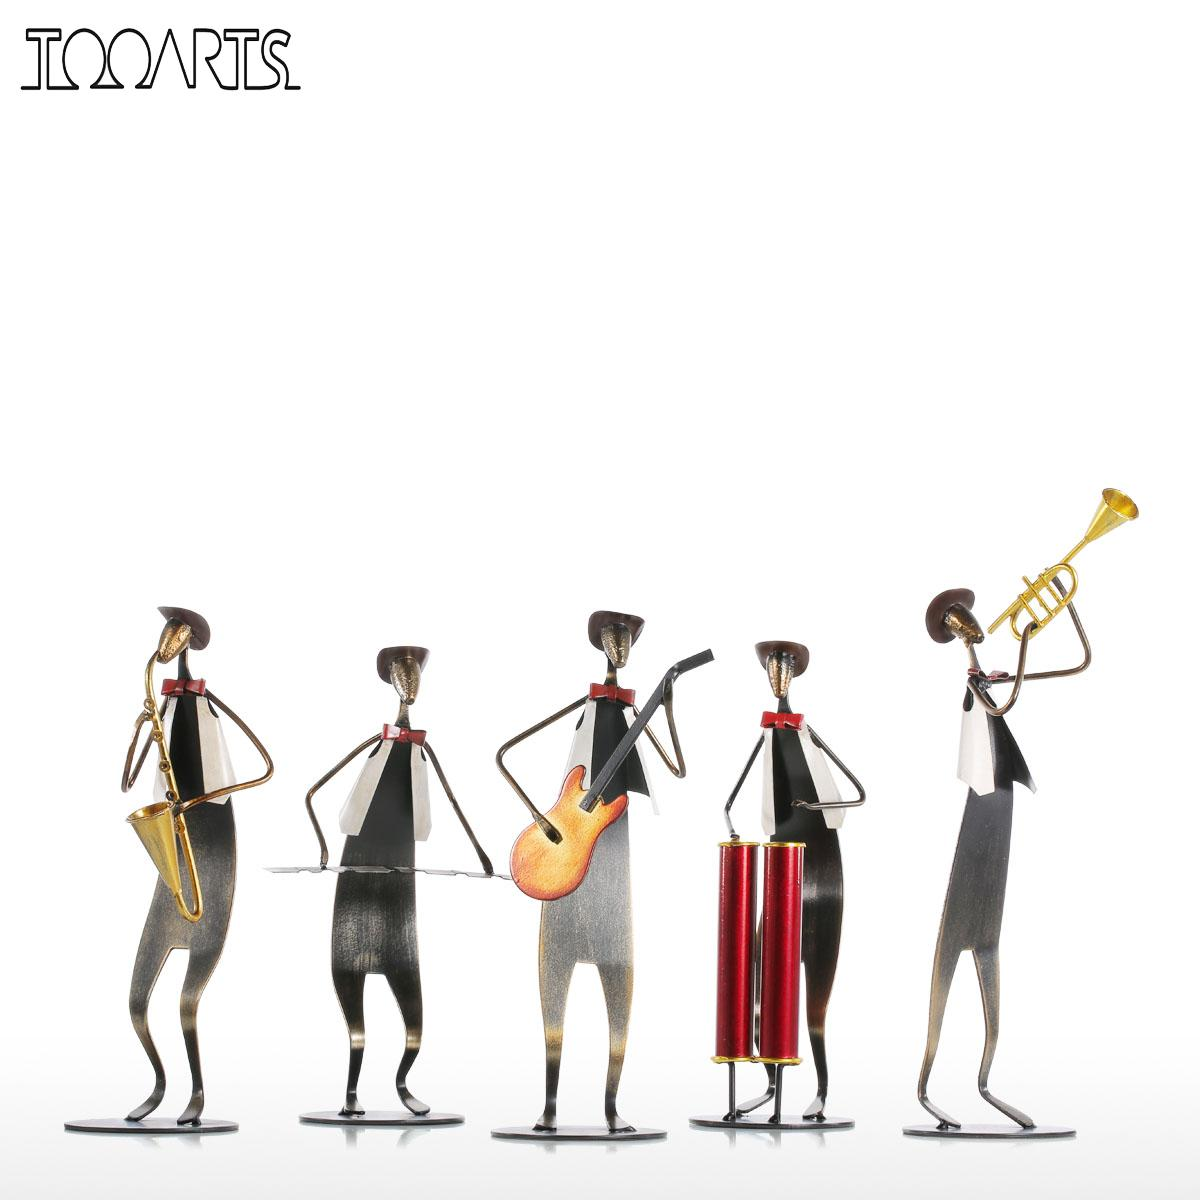 Tooarts Cowboy Band / Trumpet Music Trumpet Playing Metal ...